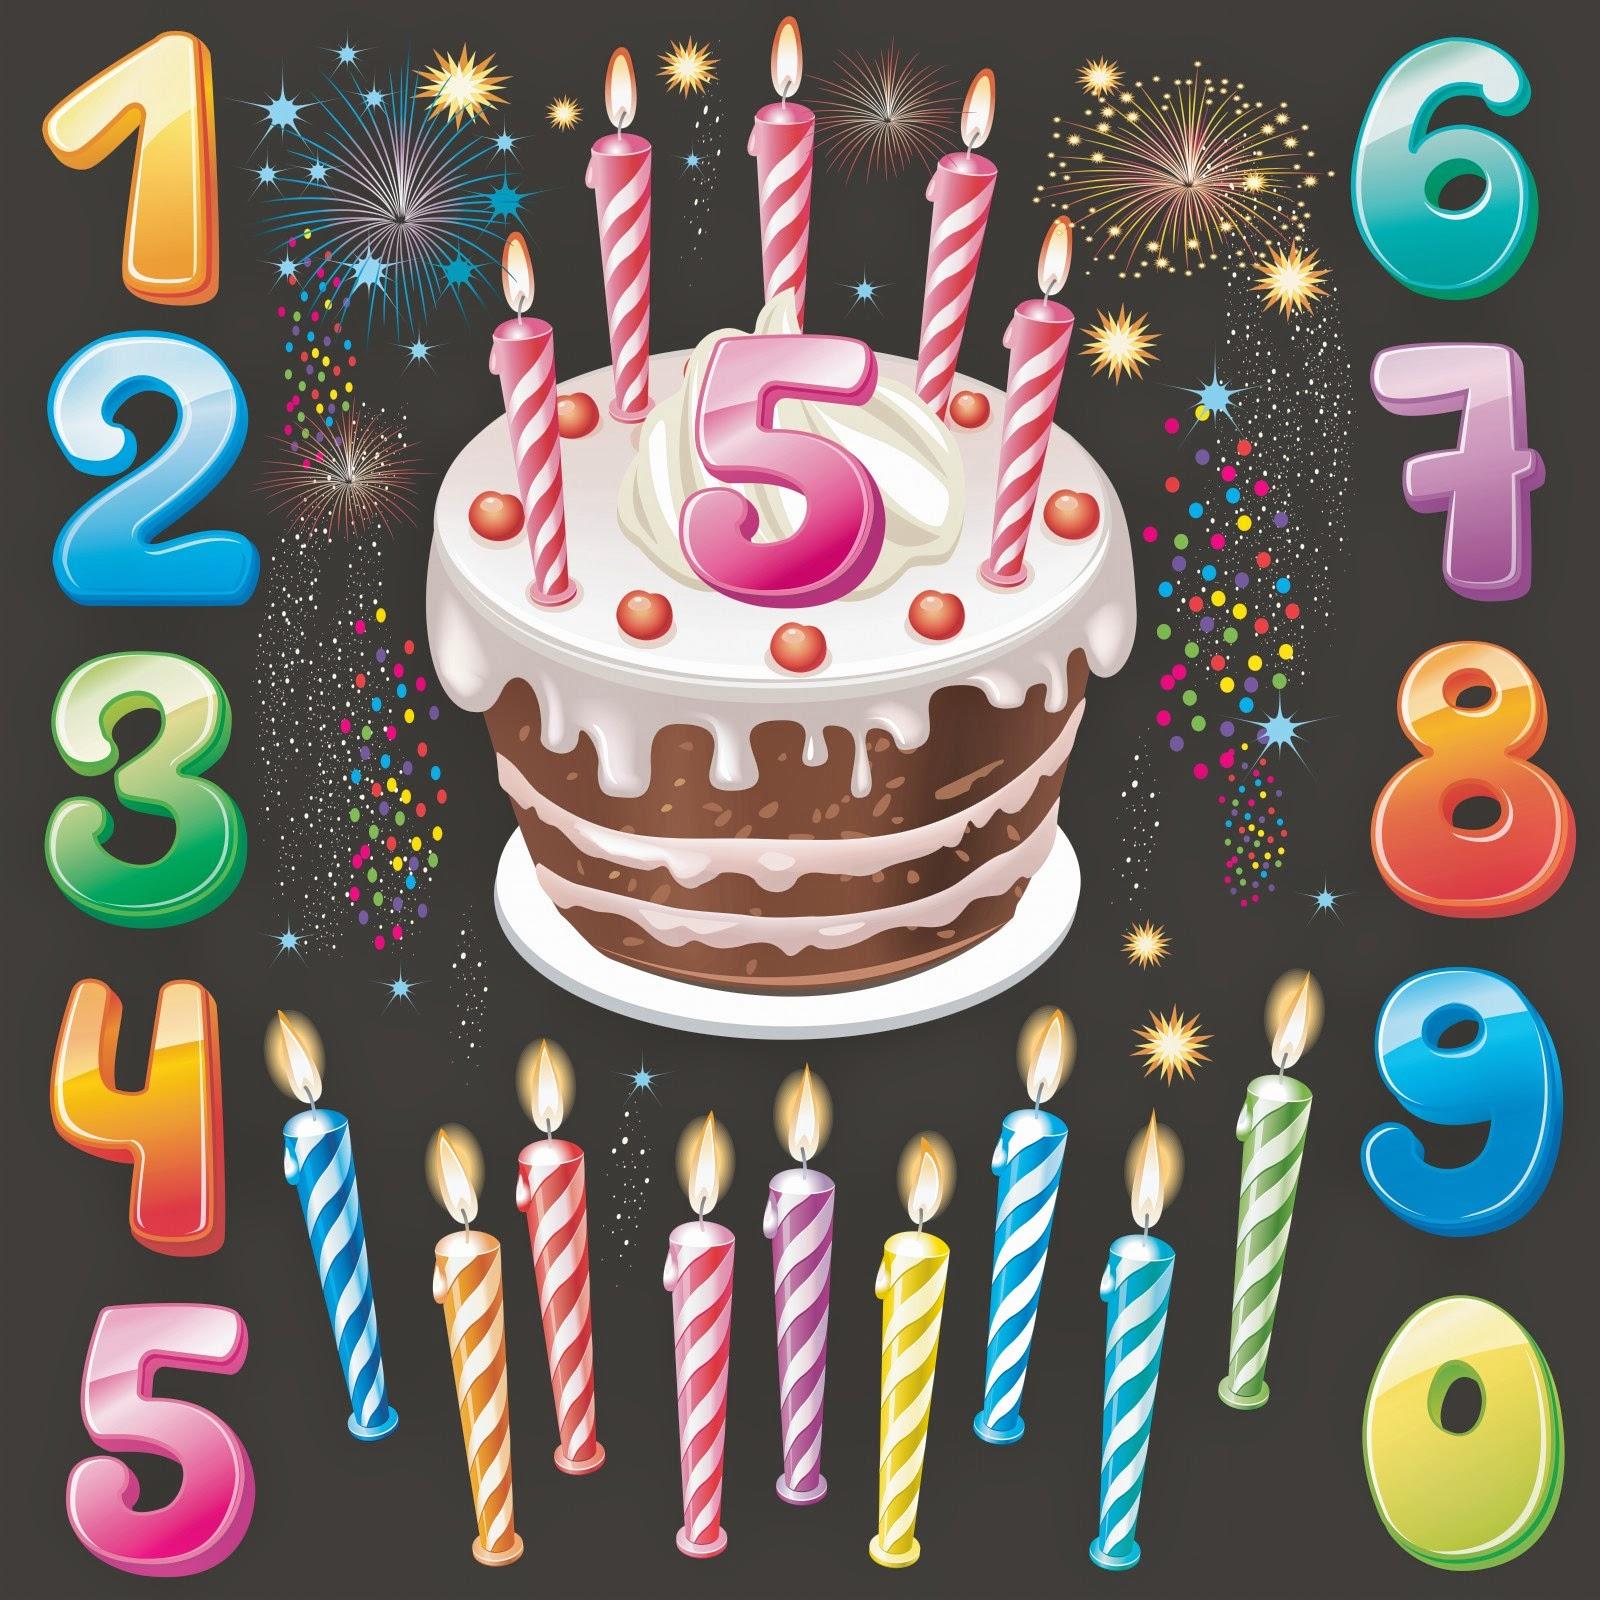 Doc Free Sms Birthday Cards happy birthday sms messages – Free Birthday Cards Via Text Message